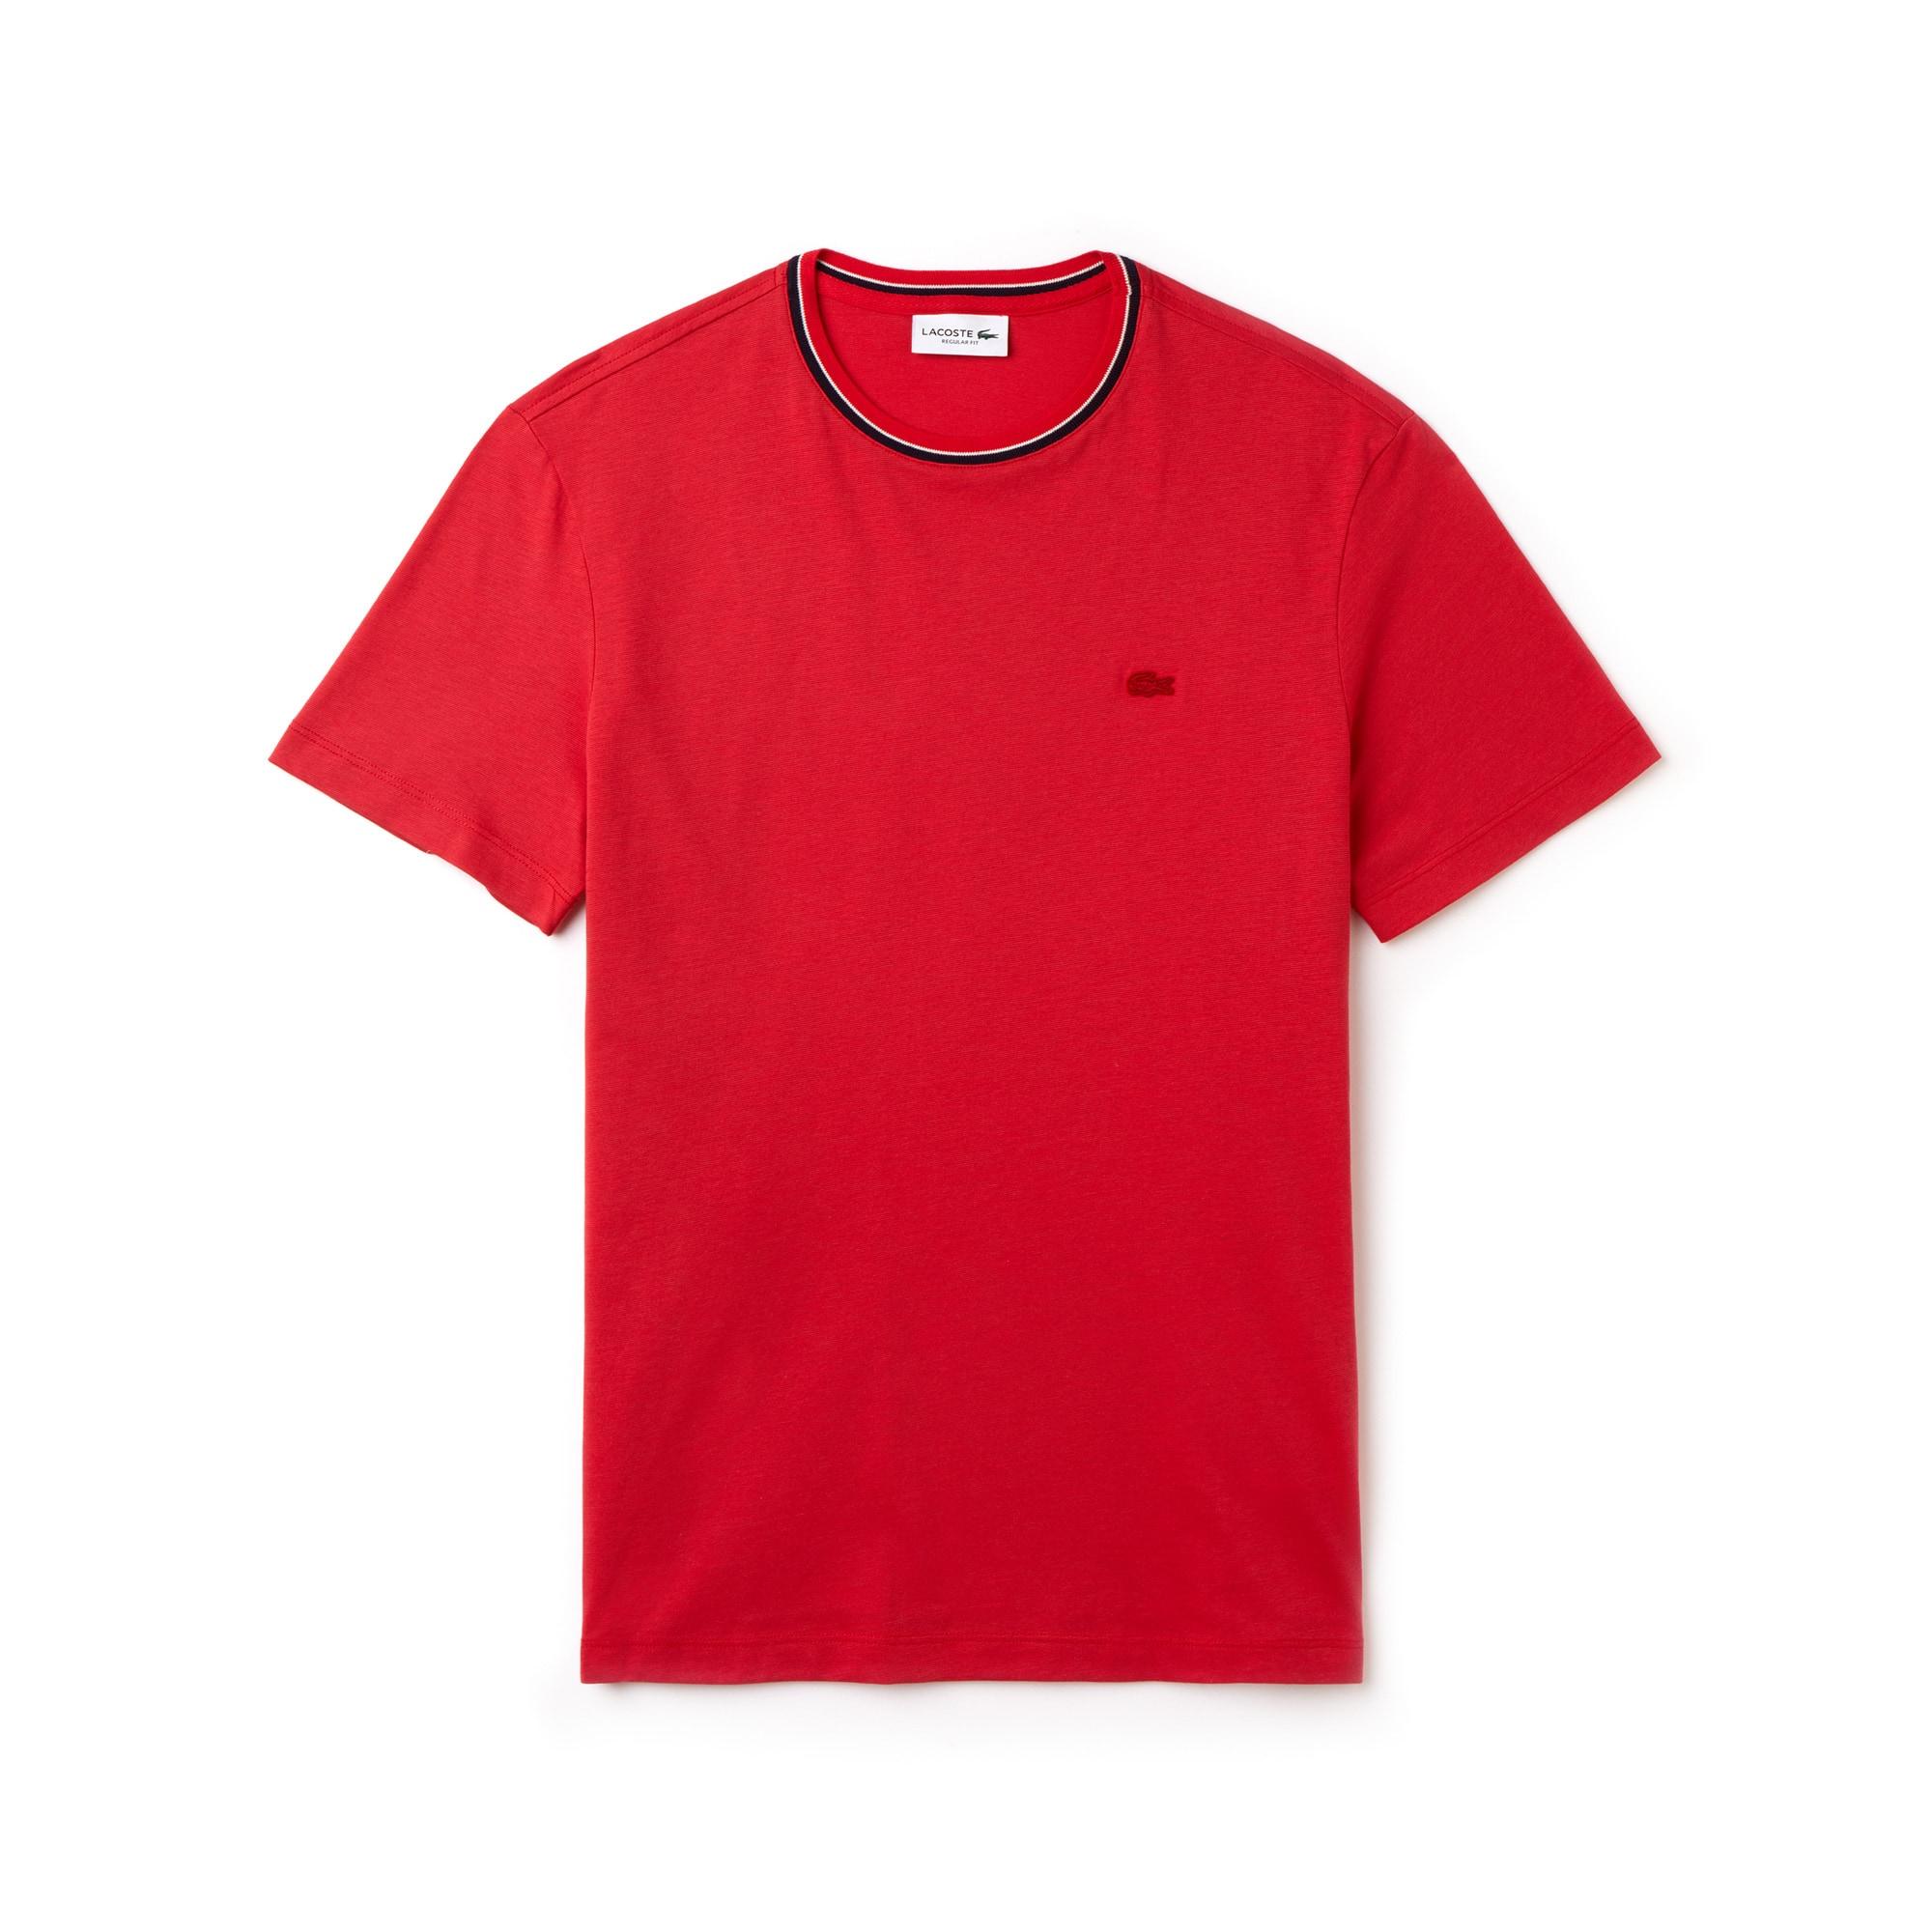 Men's Contrasting Crew Neck Flamme Cotton Jersey T-shirt